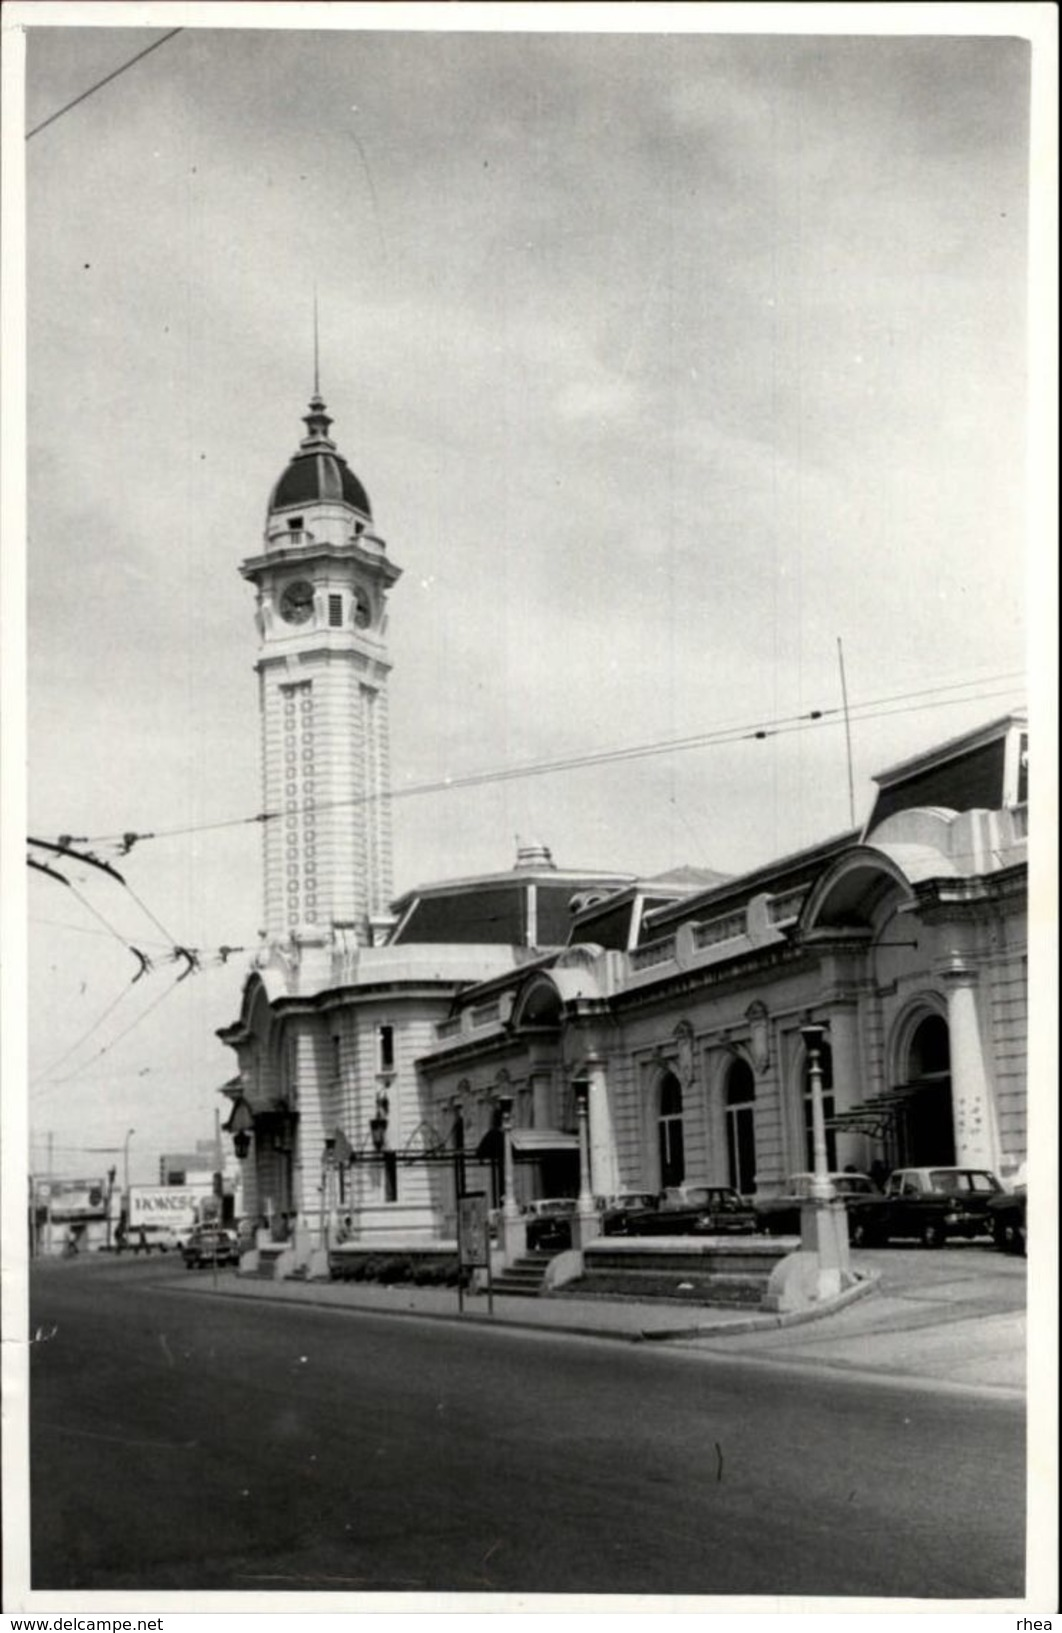 TRAINS - ROSARIO - SANTA FE - ARGENTINE - Gare - 1976 - Trains